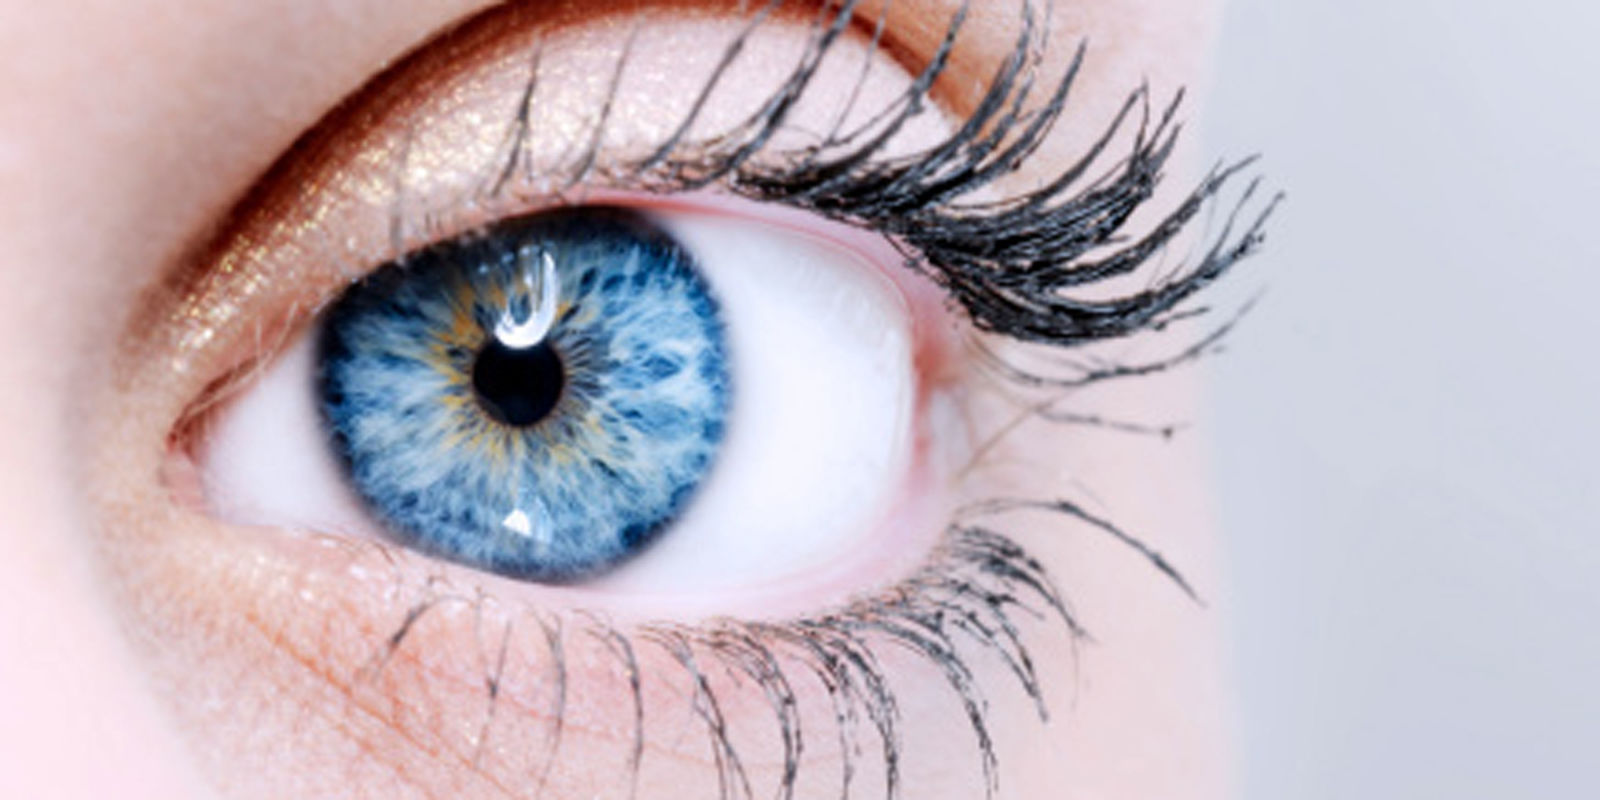 718cd974b20 Dr Smita Mukherjee - Page 2 of 2 - Insightful Eye Care